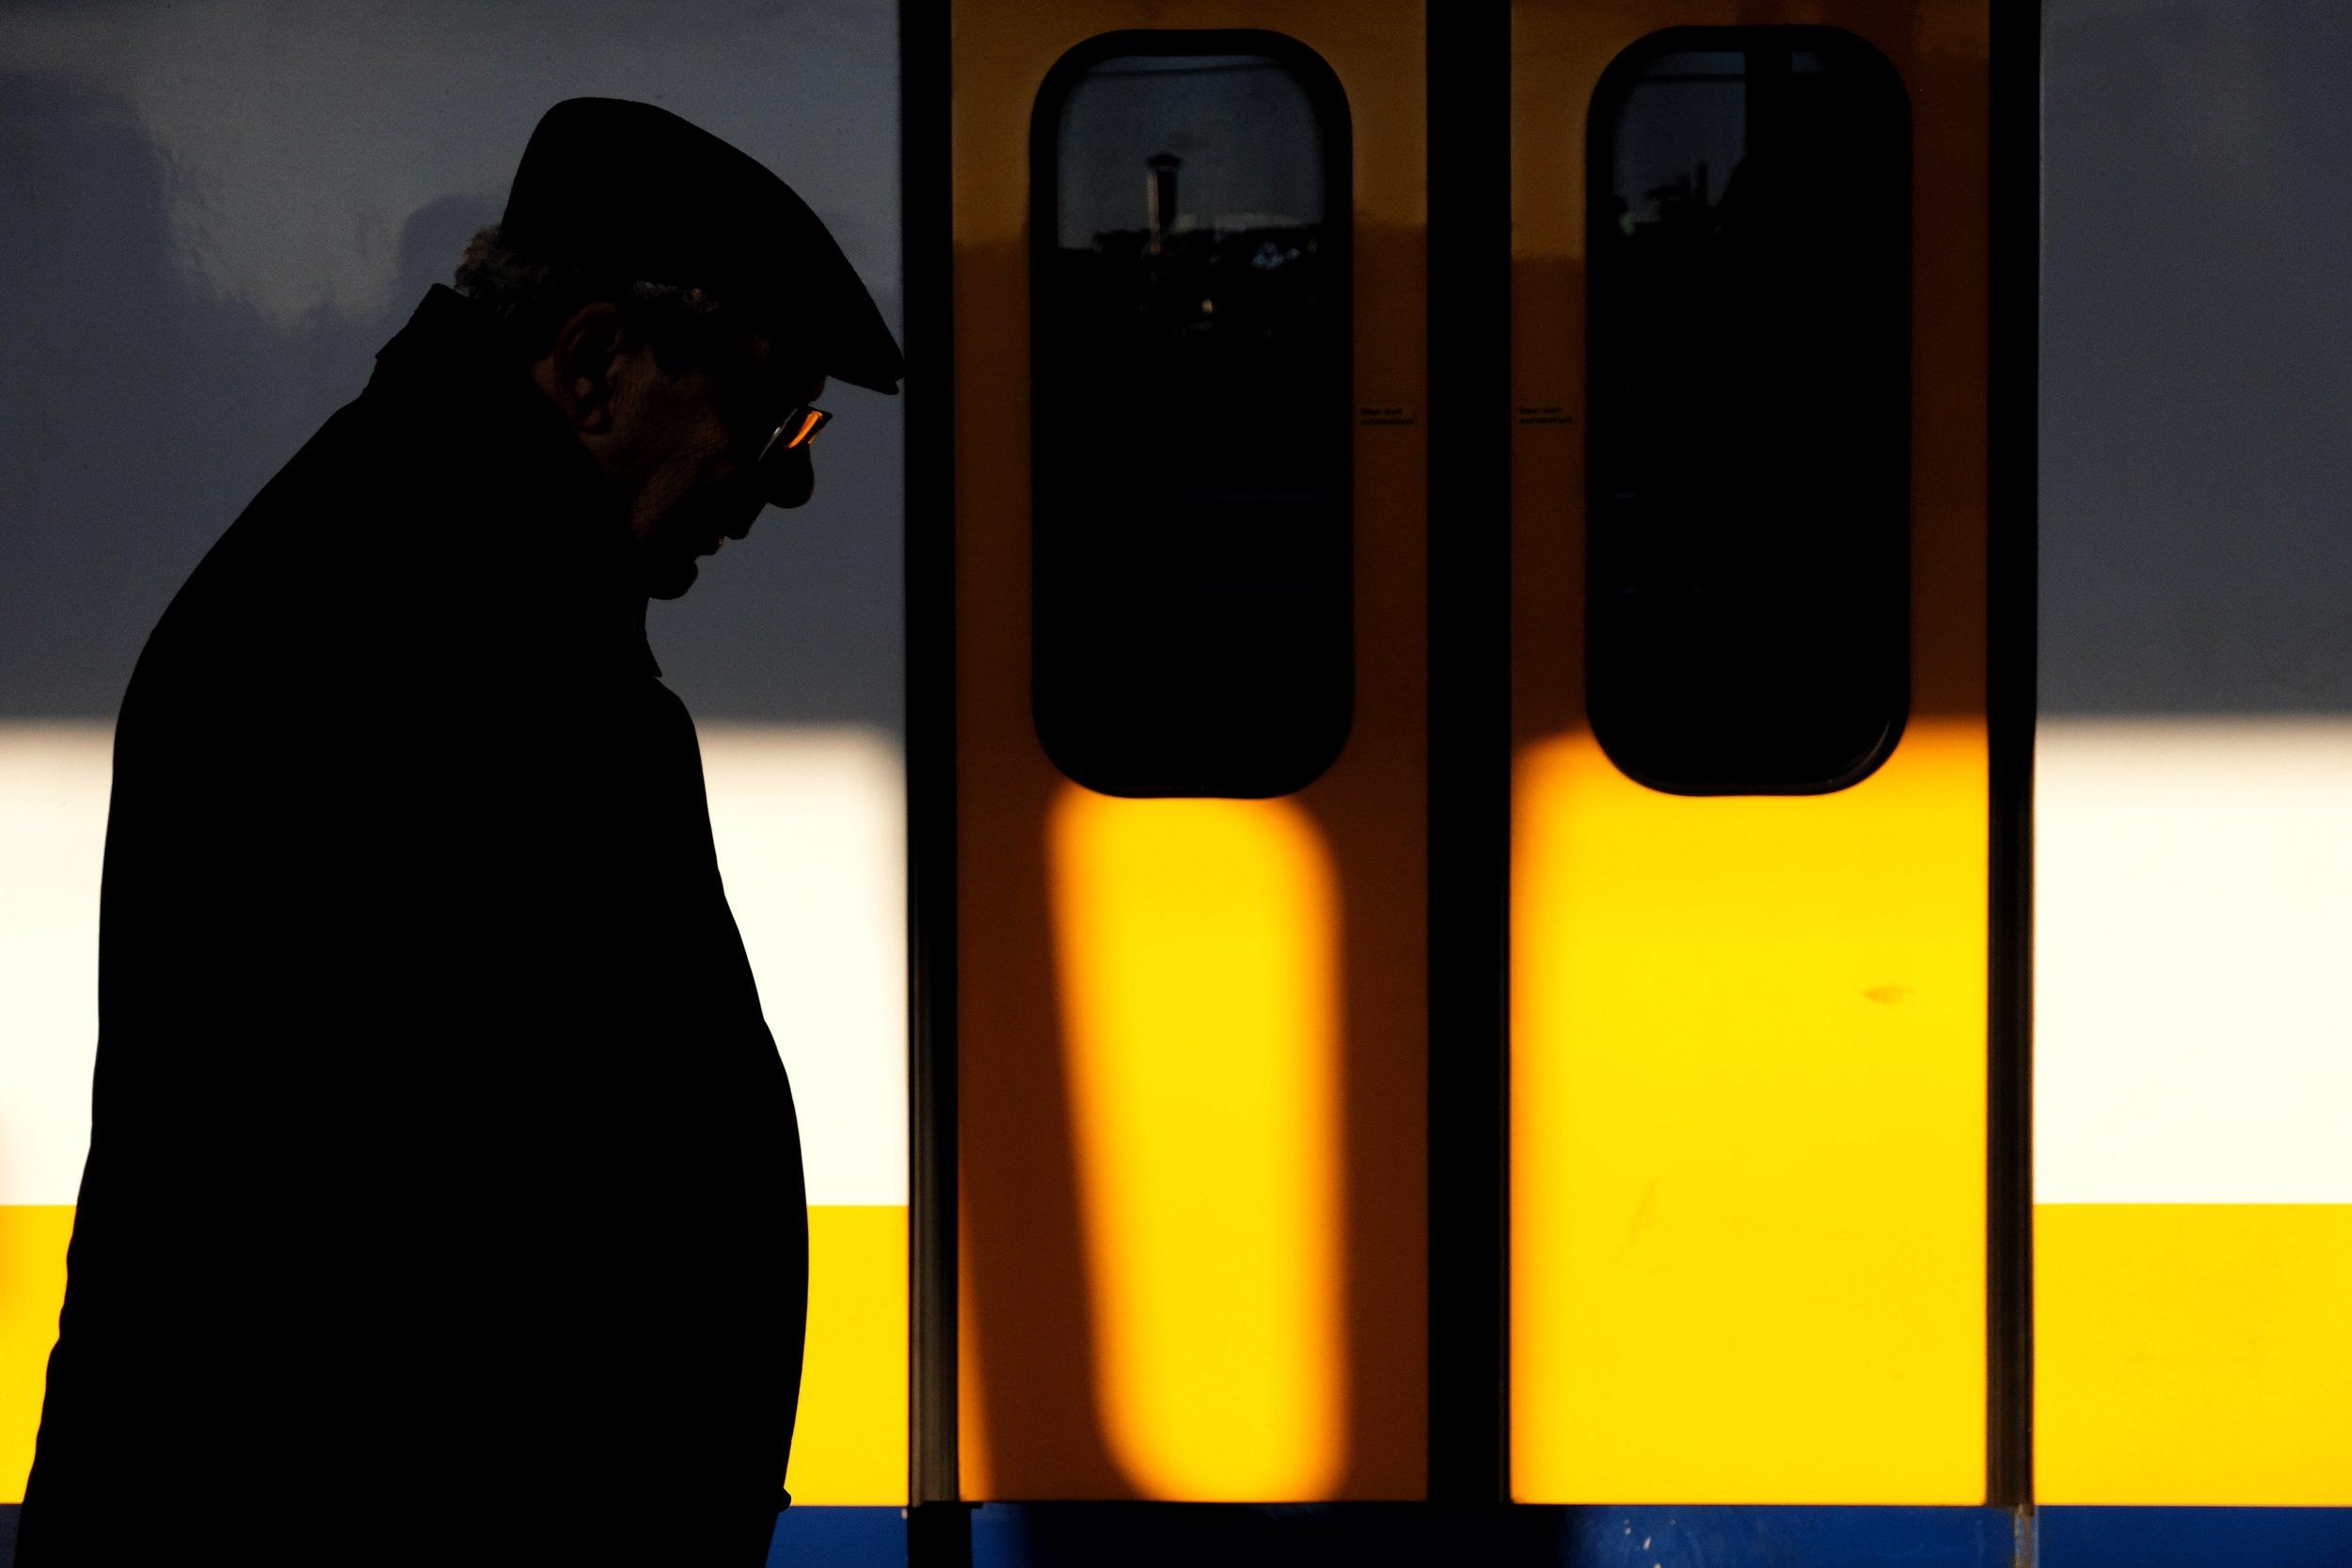 Lot 563 Golden Hour at Haarlem Station - Photograph